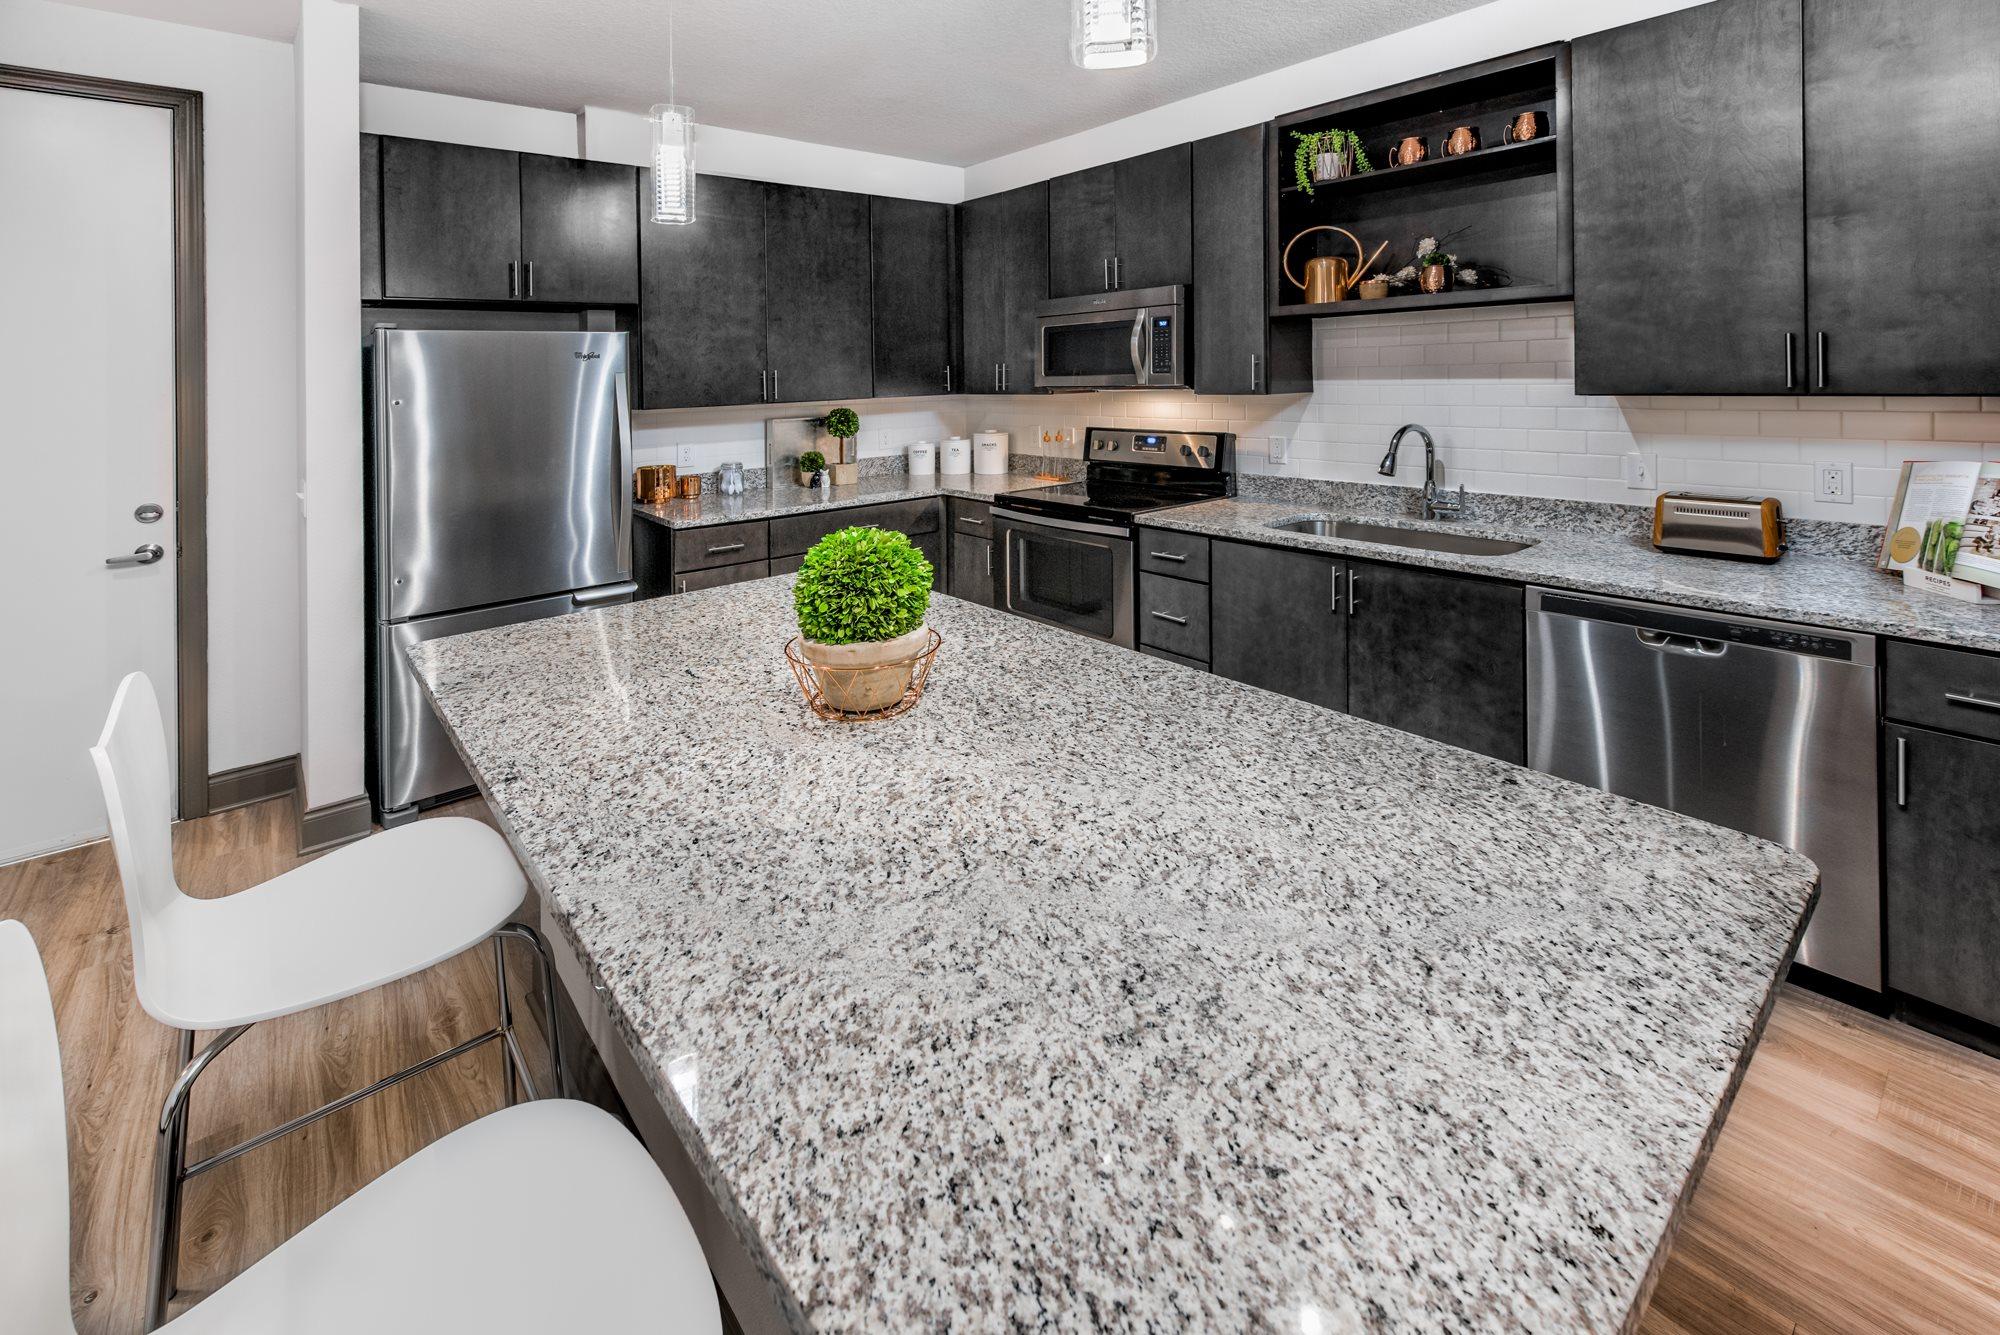 Granite Countertops in Kitchen at  Lugano Apartments, Kissimmee, FL 34741